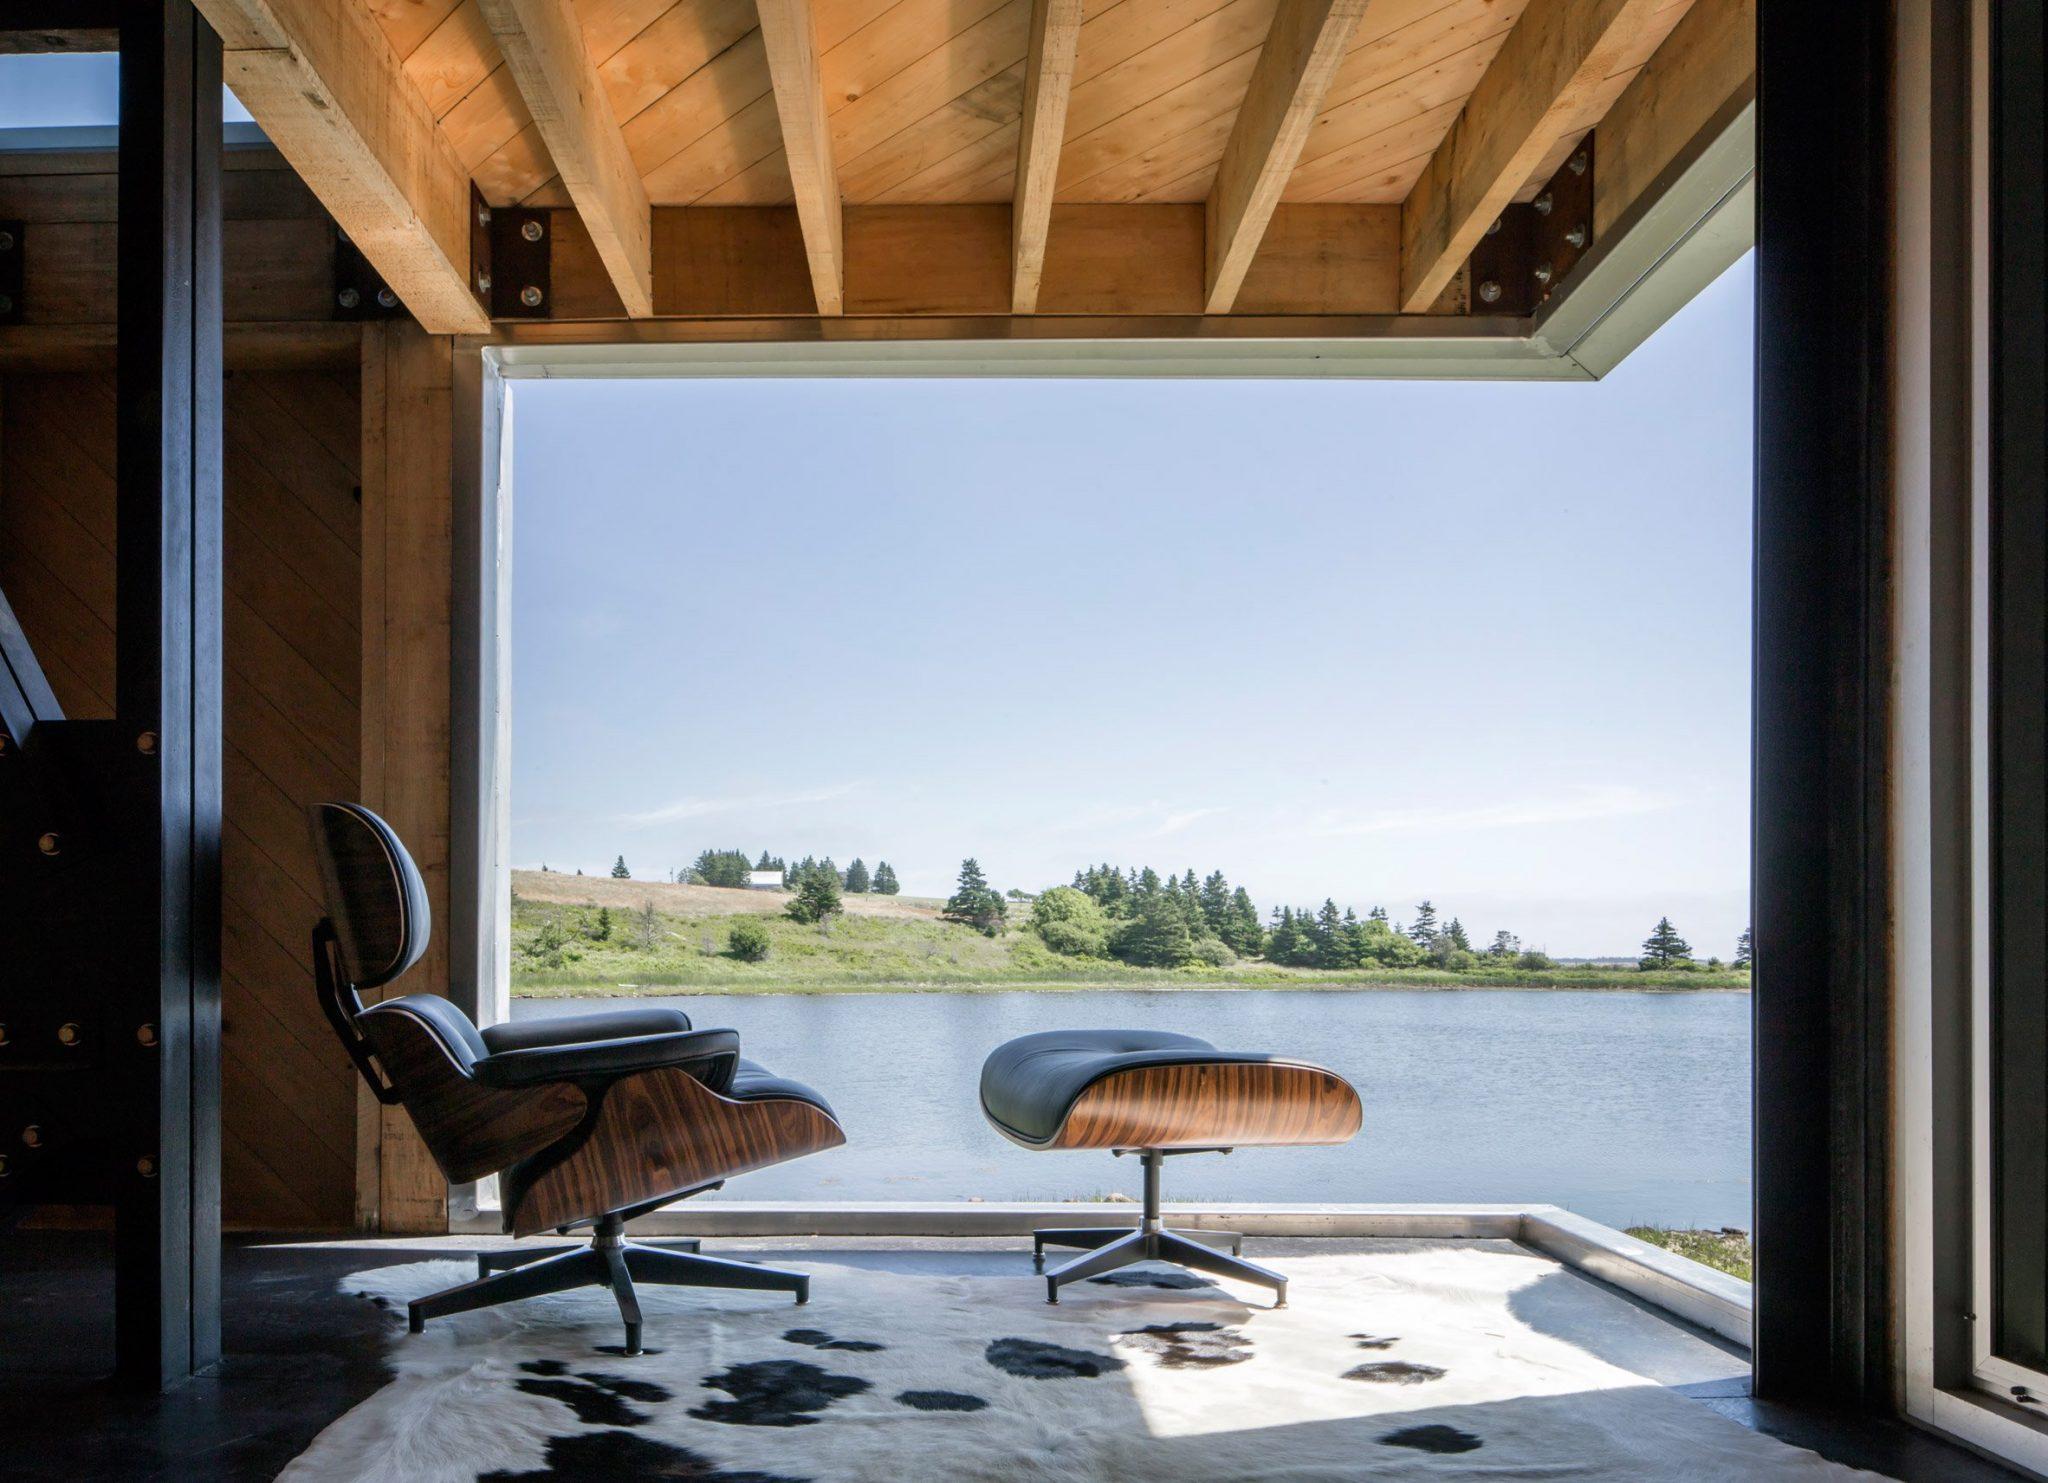 dreamy coastal house by studio mackay lyons sweetapple 5 Dreamy Coastal House by Studio MacKay Lyons Sweetapple